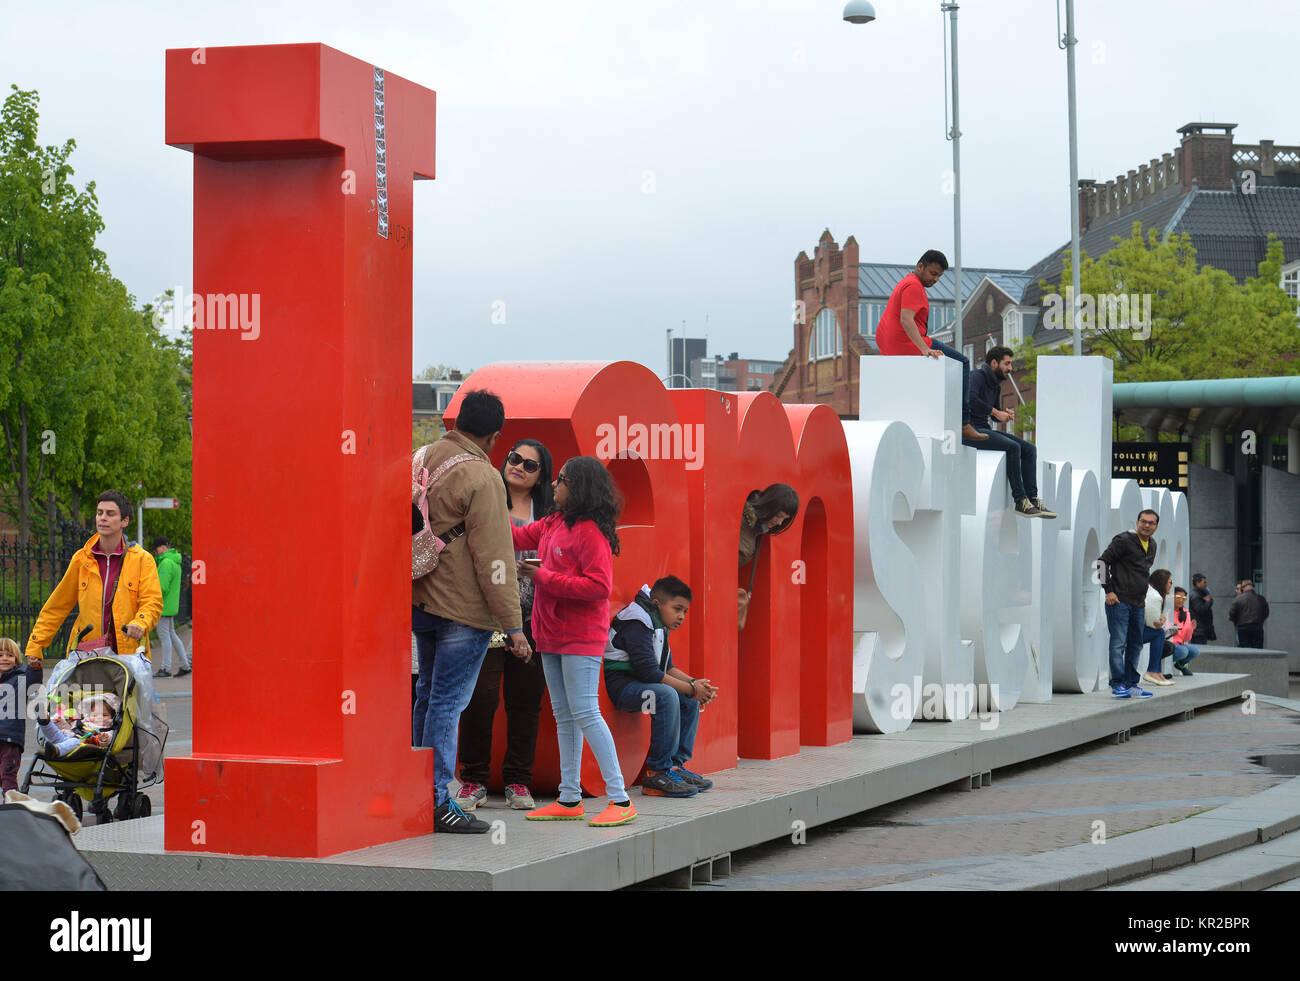 Tourists, Museumplein, Amsterdam, the Netherlands, Touristen, Niederlande - Stock Image